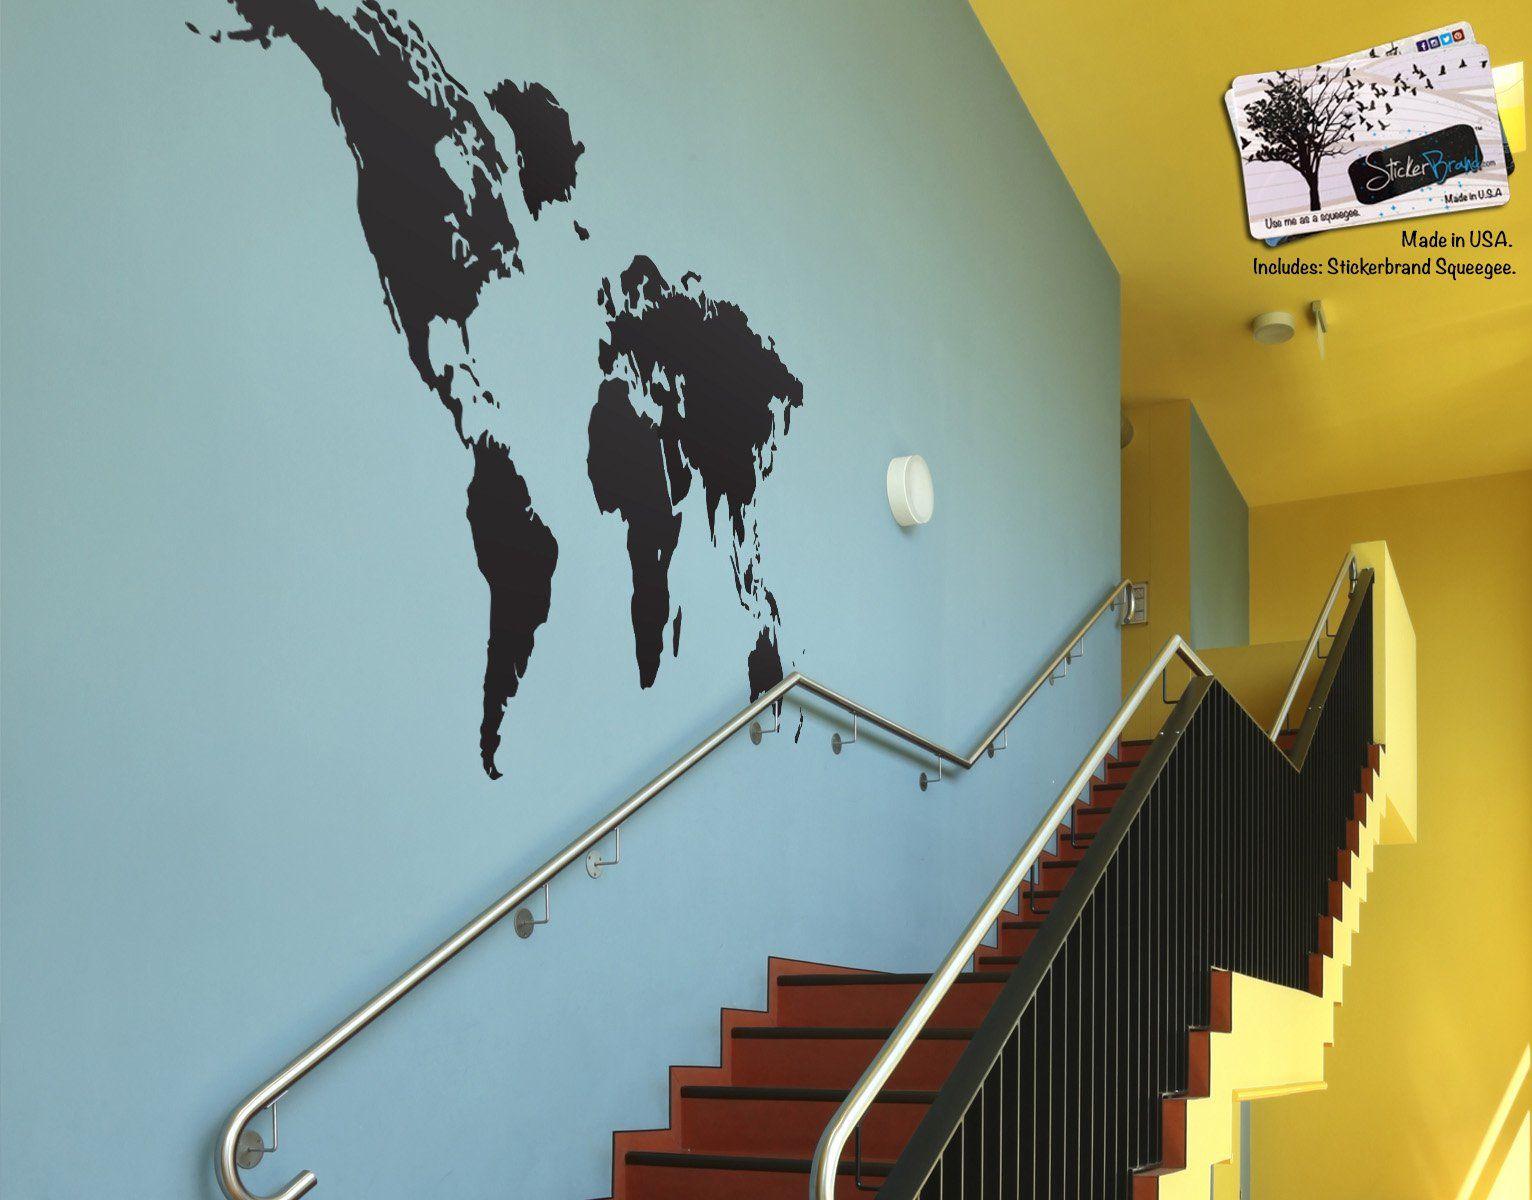 Black world map wall decal sticker stickerbrand home decor vinyl